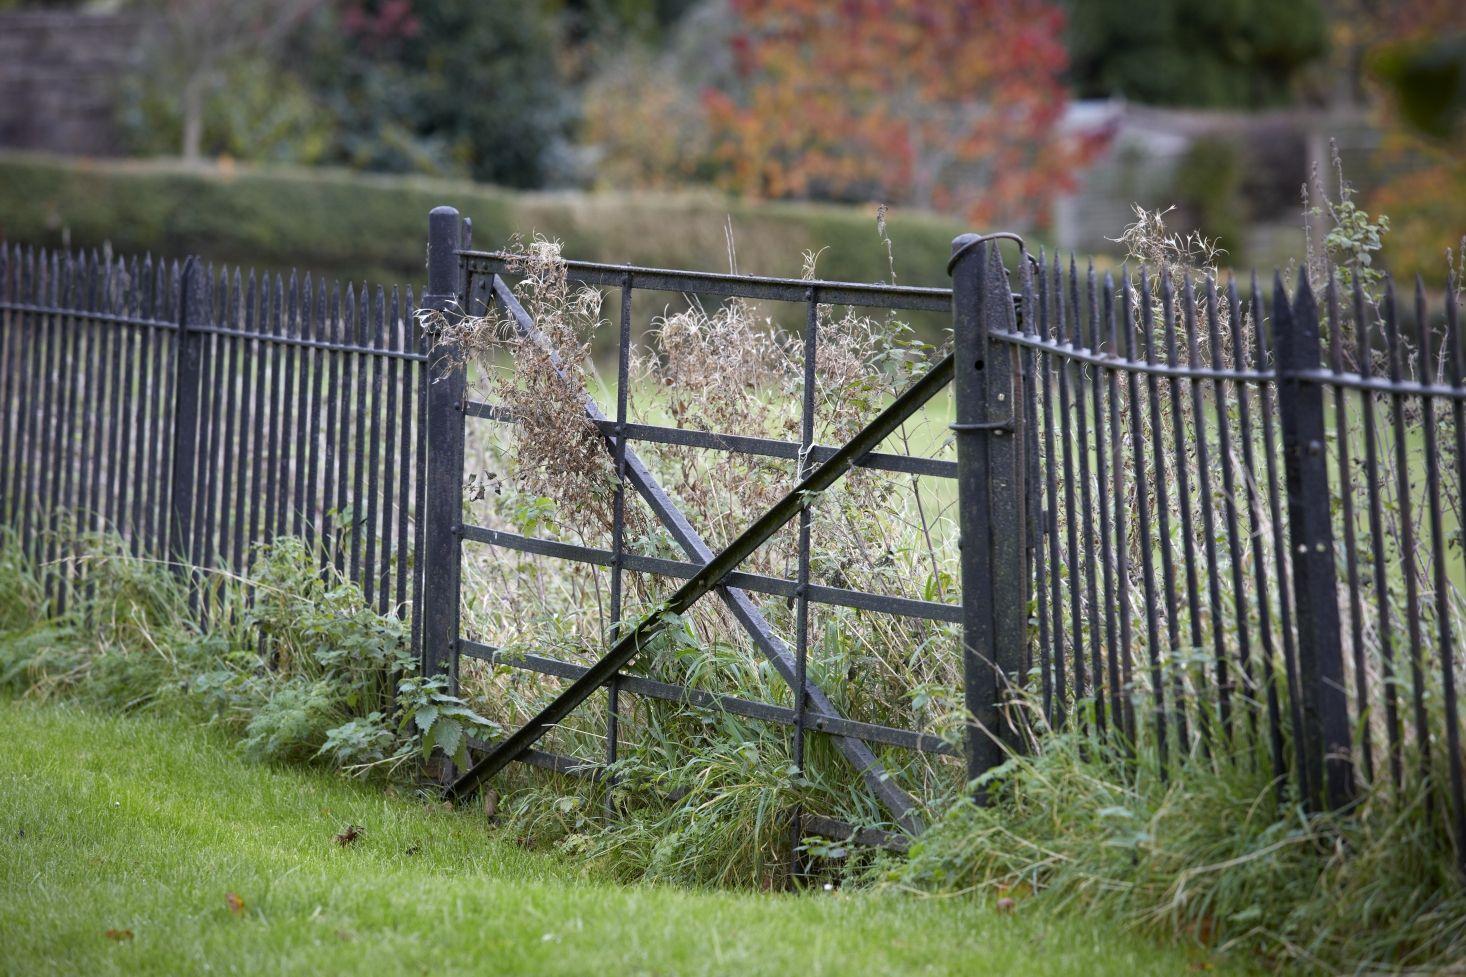 Garden Gate Design: 10 Iron Entryways with Curb Appeal | Garden gate ...